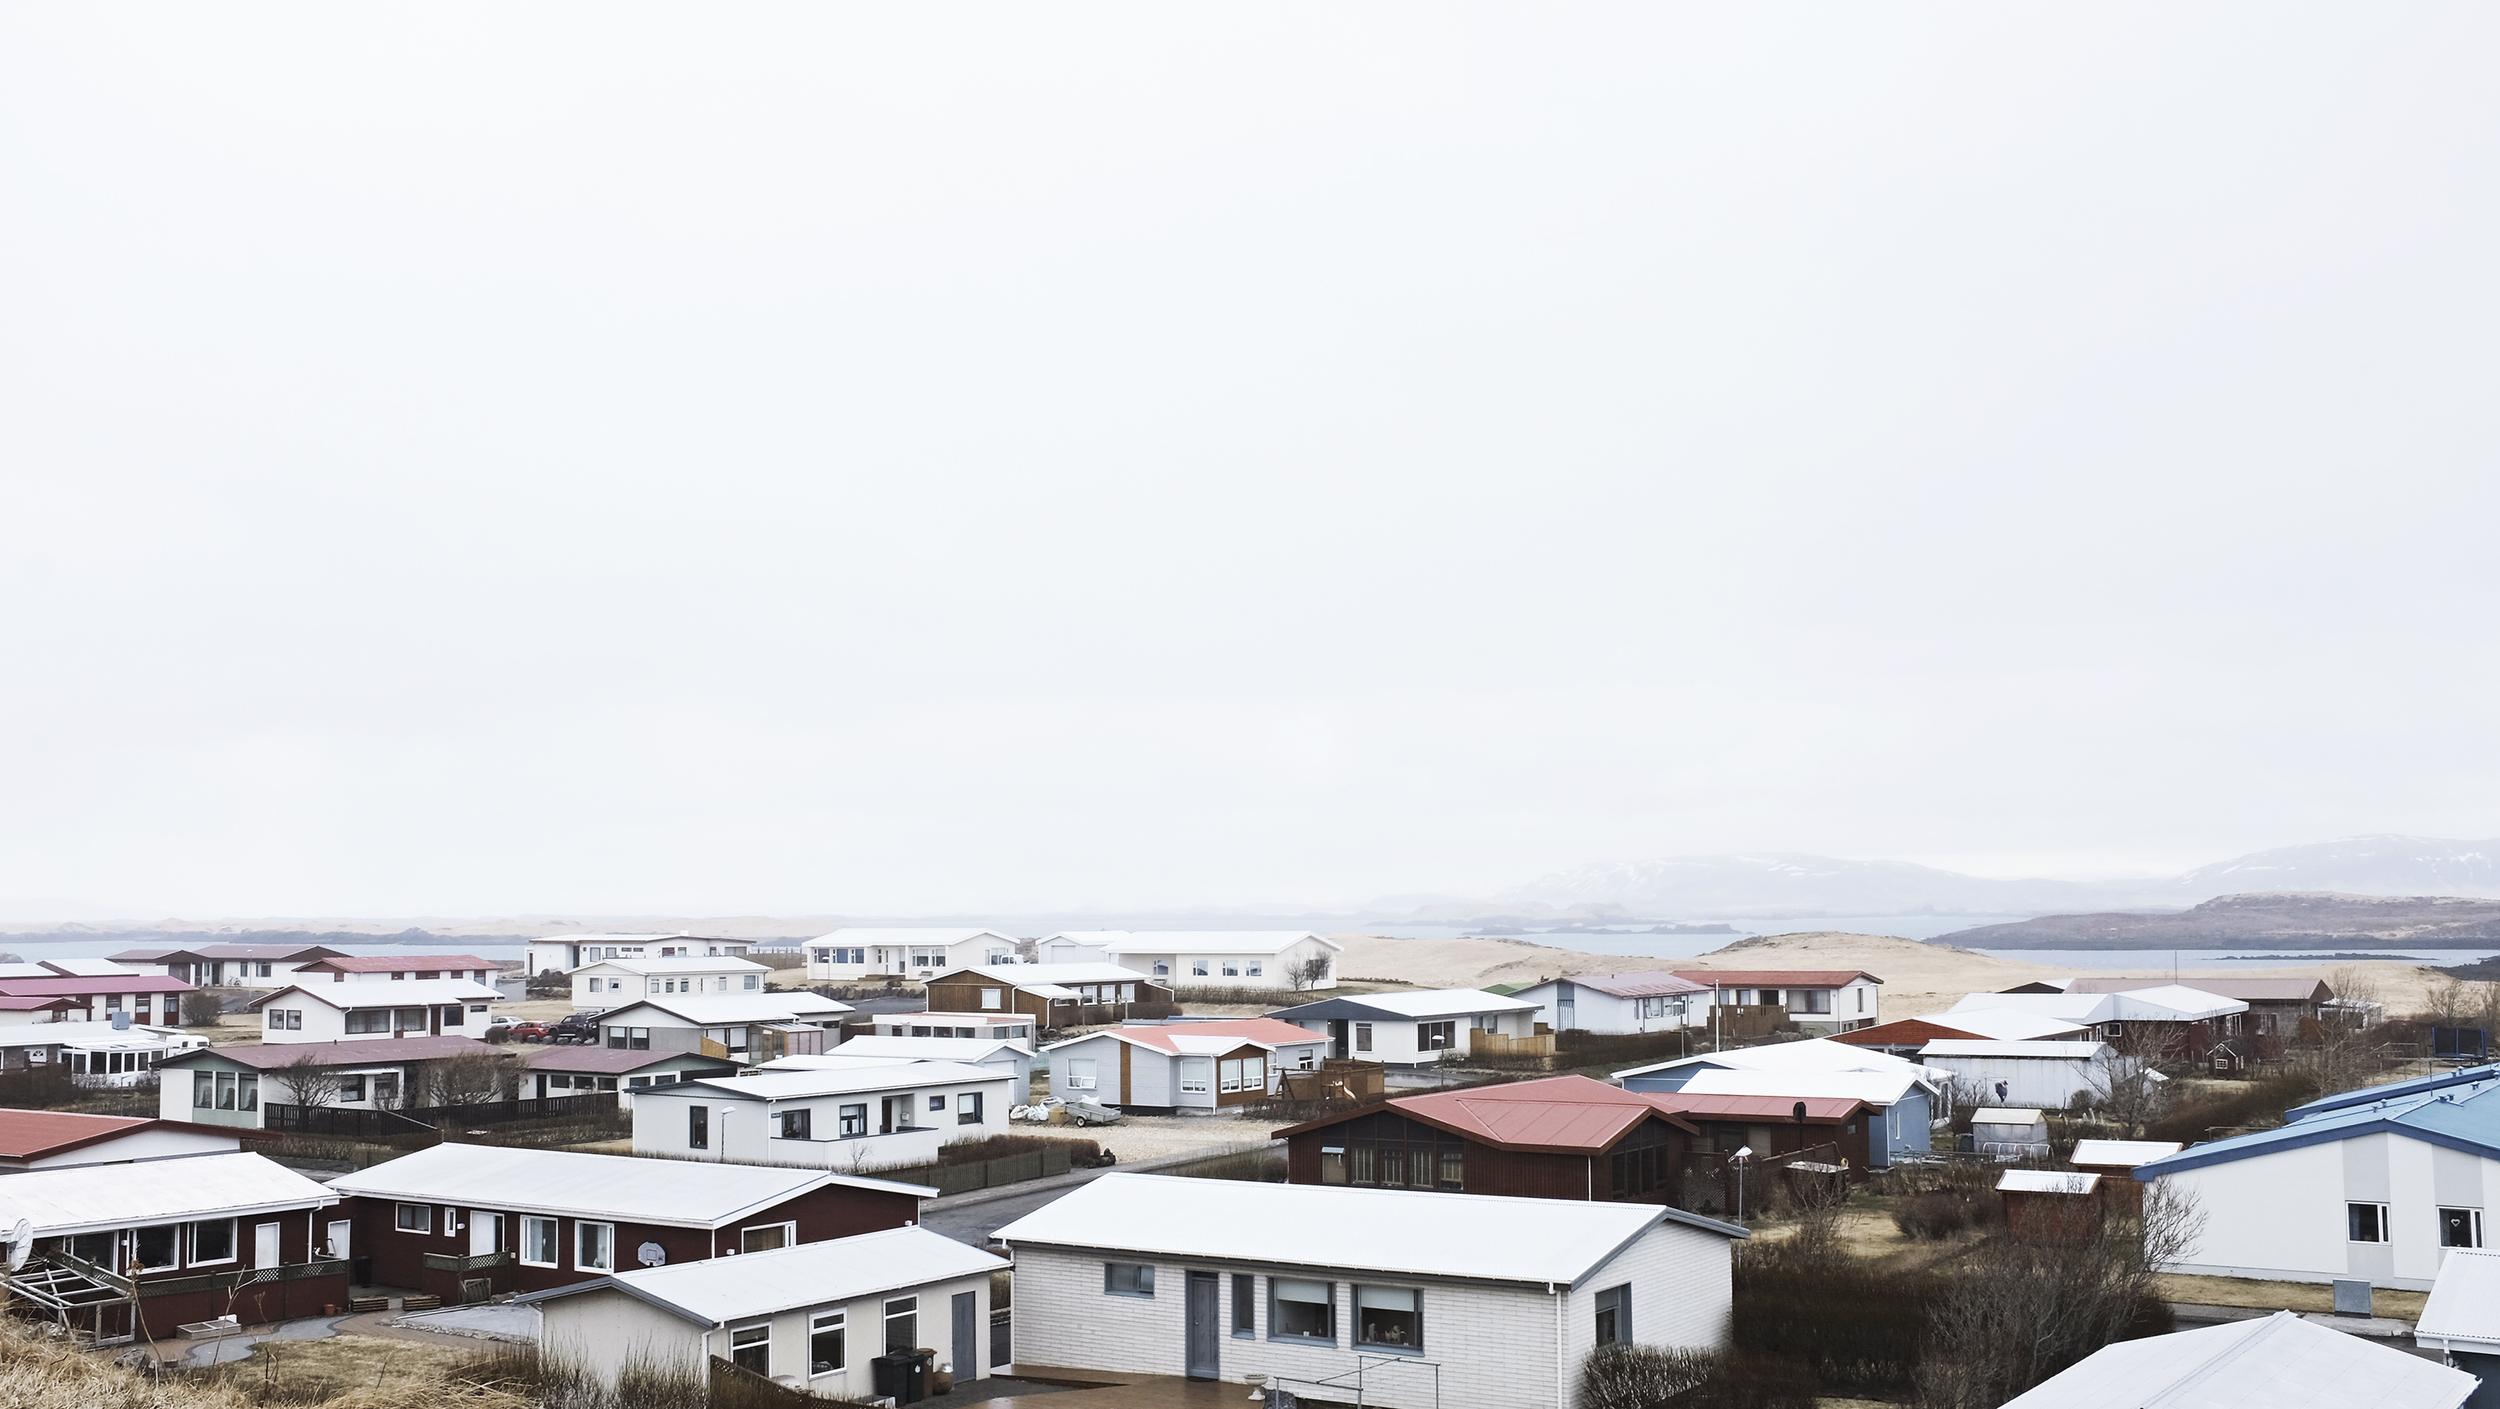 15_05_08_Iceland_West0139F.jpg